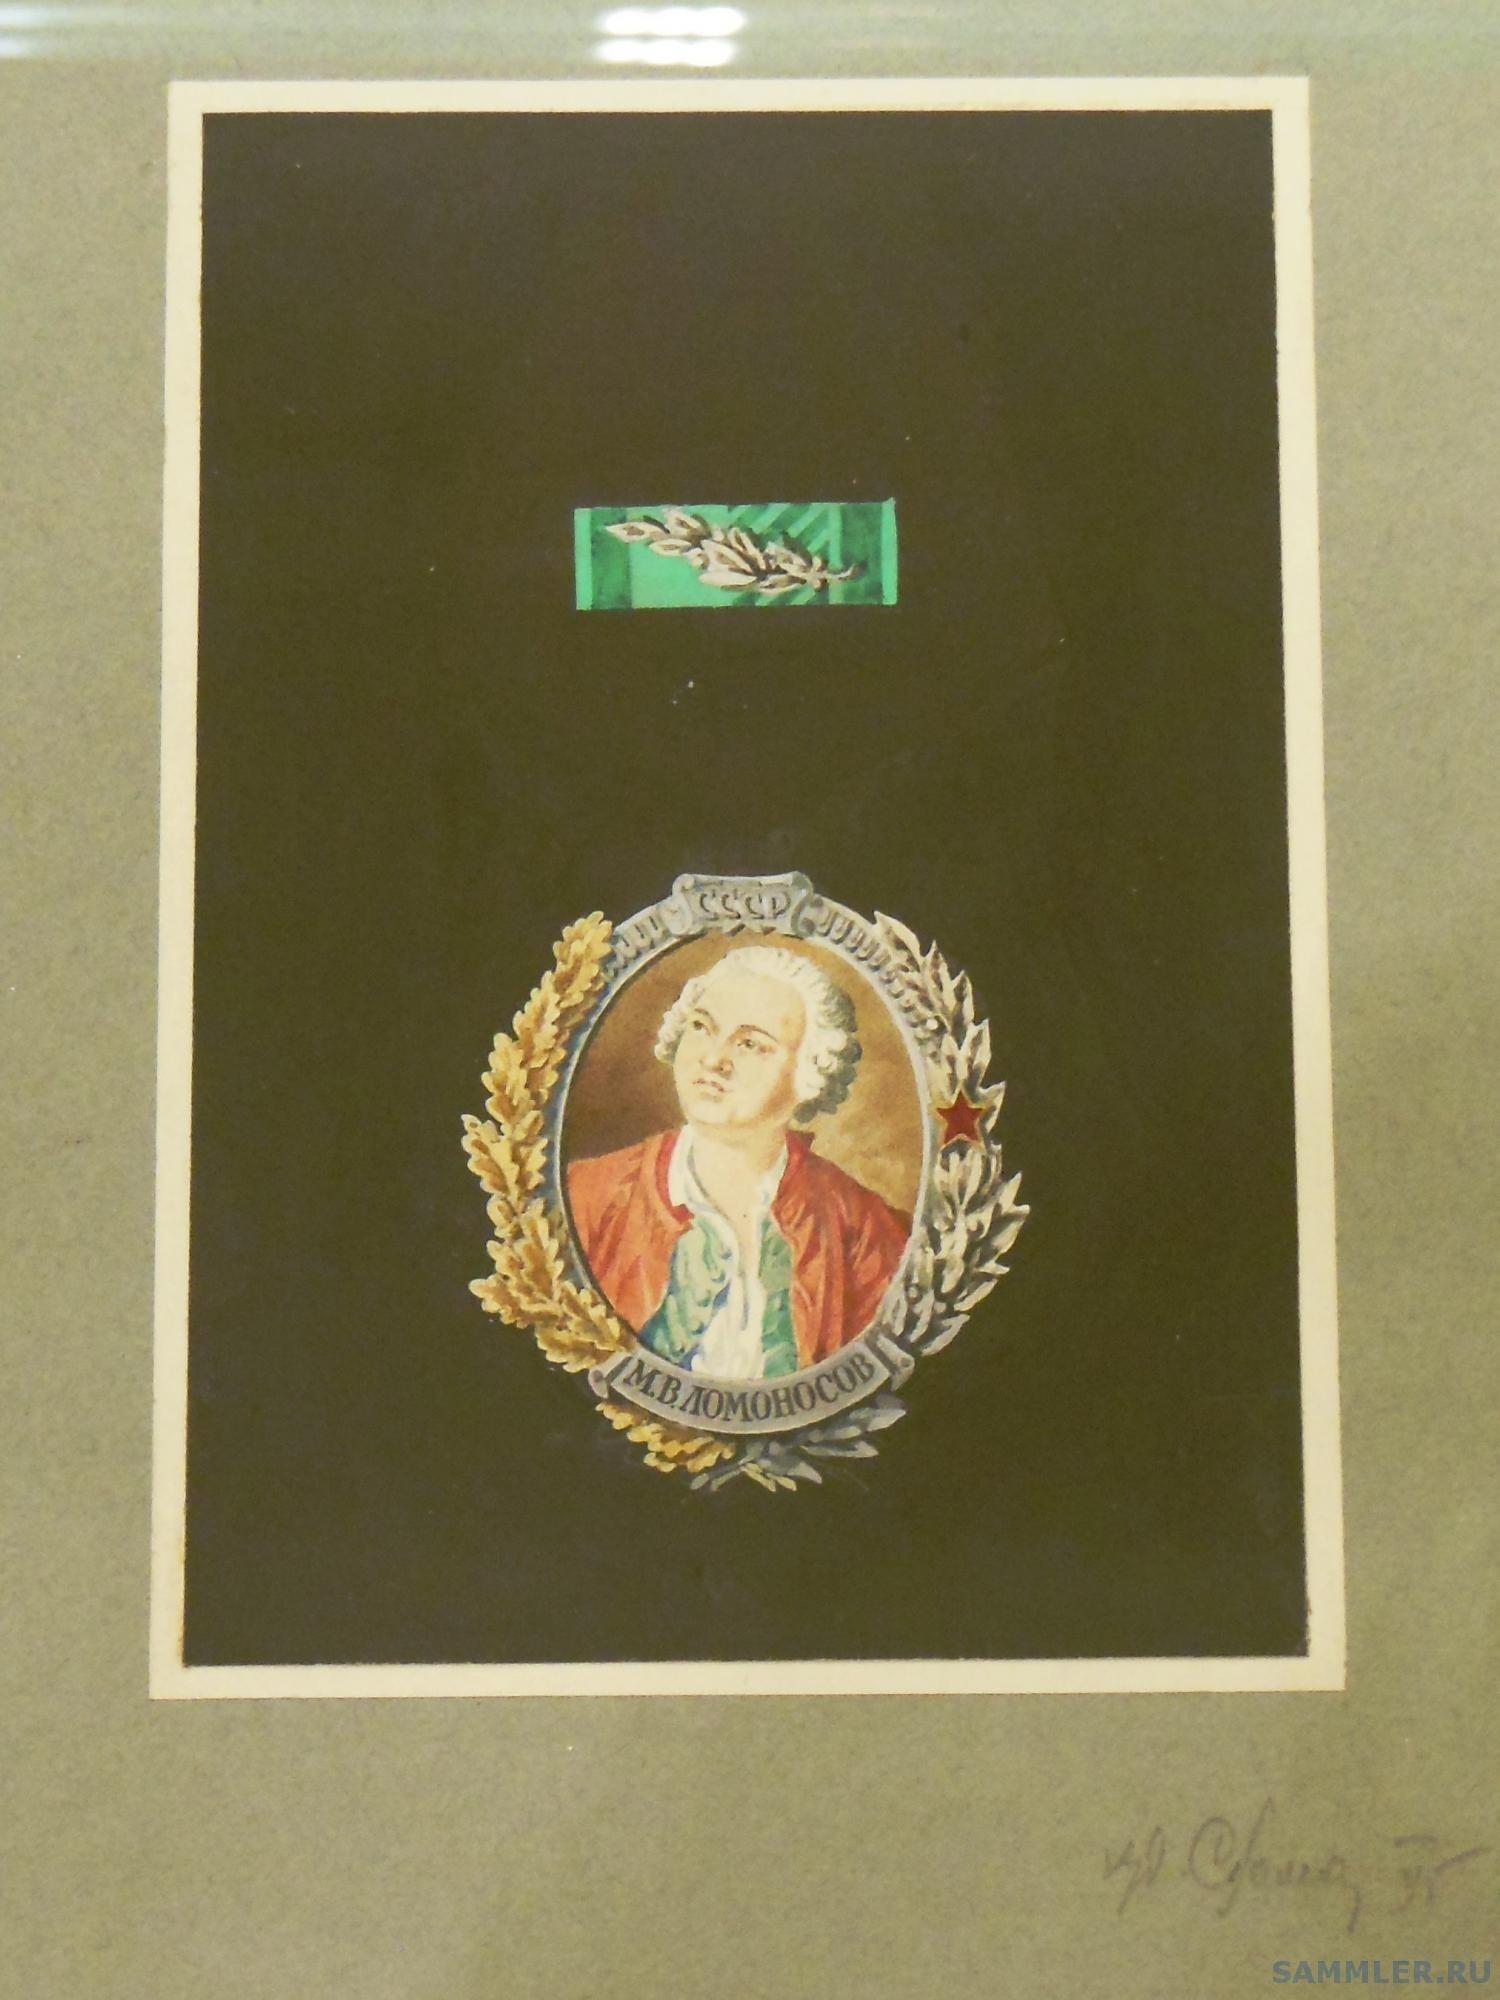 Проект ордена Ломоносова - С. А. Поманский, 1945.JPG